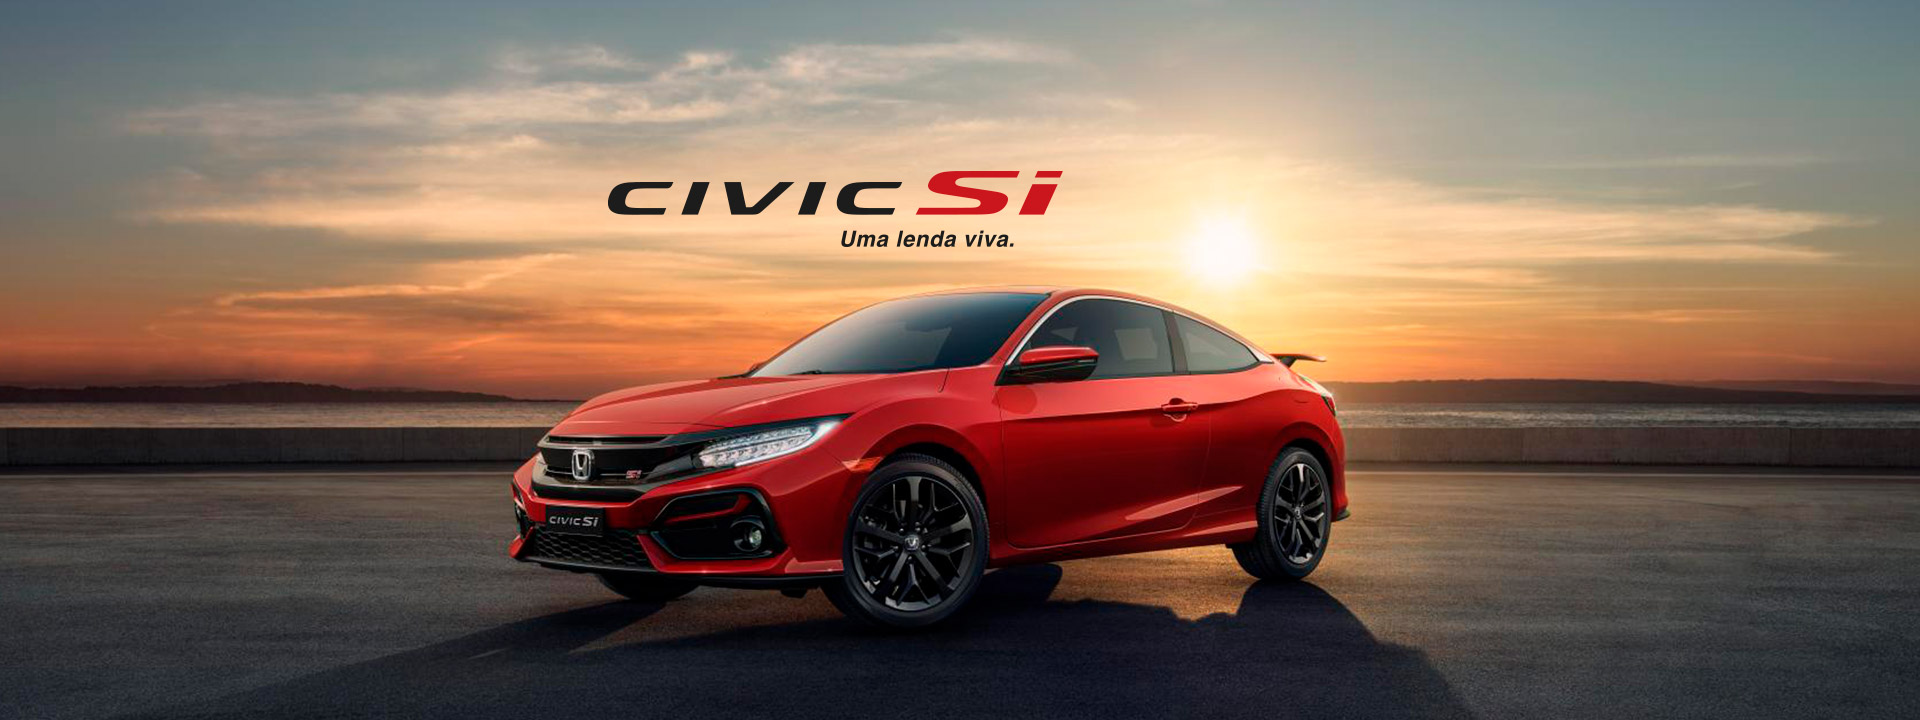 Civic SI